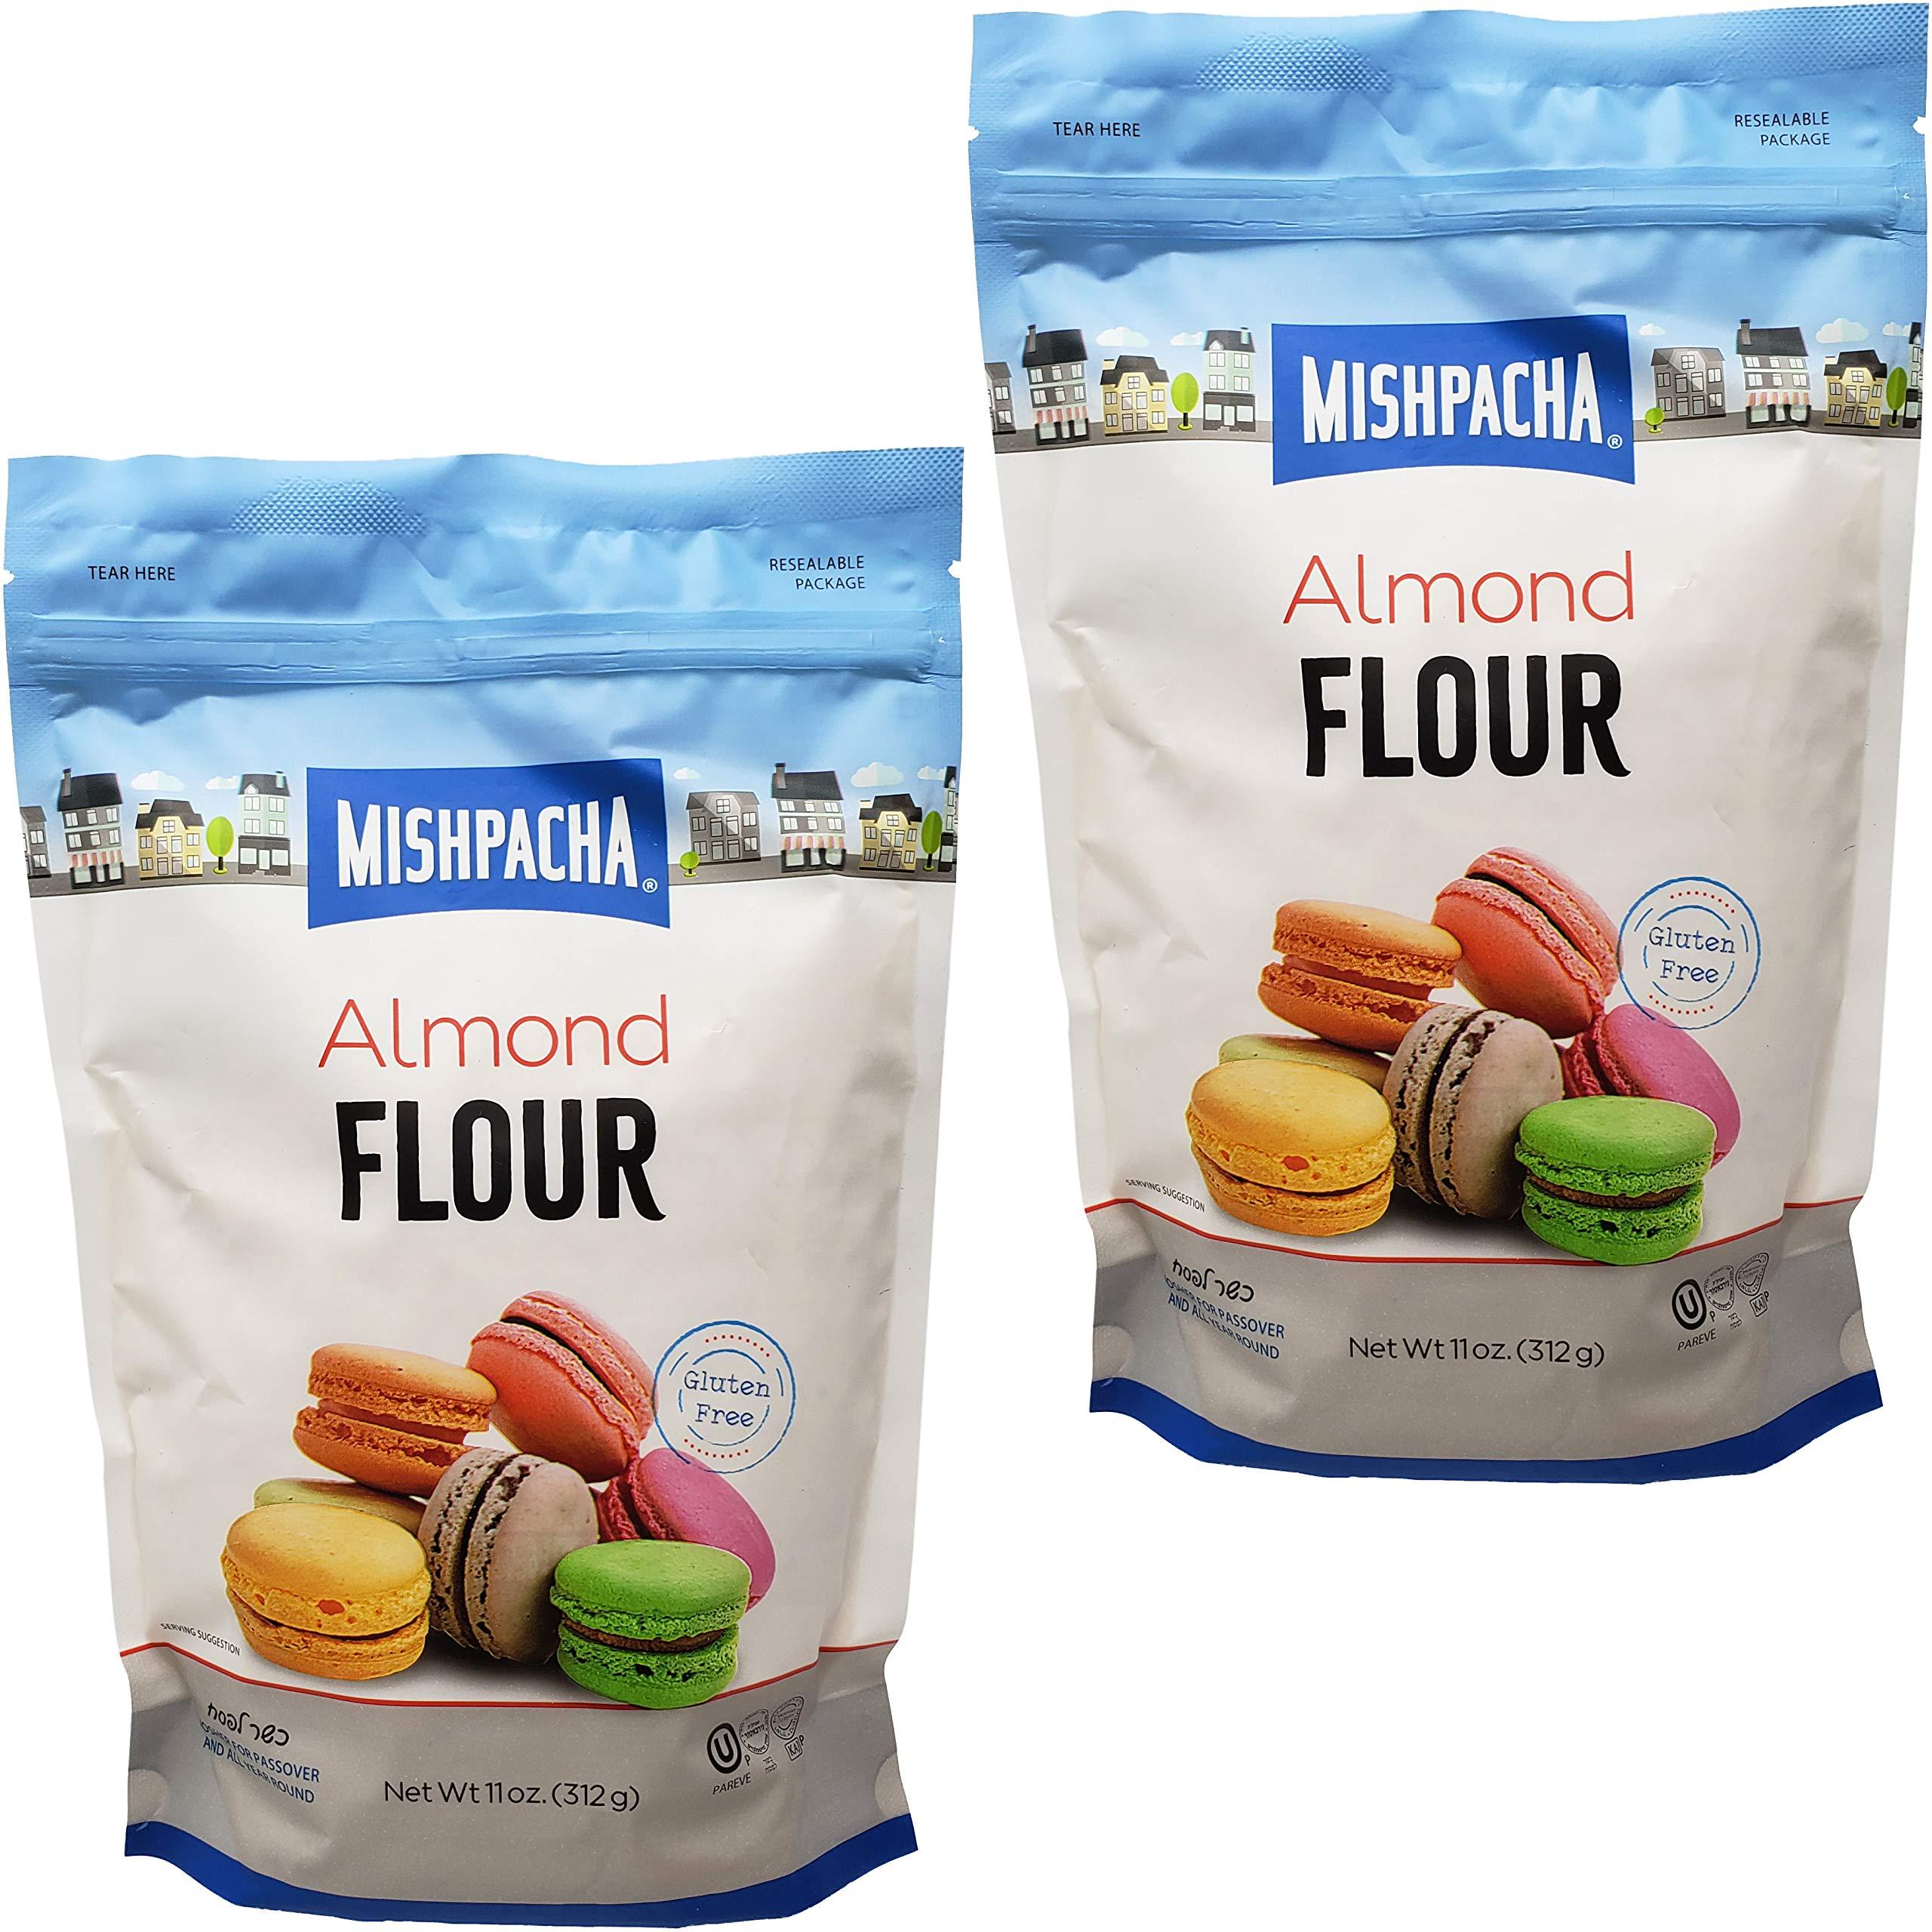 Mishpacha Almond Flour Bag, Kosher For Passover, Gluten-Free, 11 Ounce Bag (2-Pack)